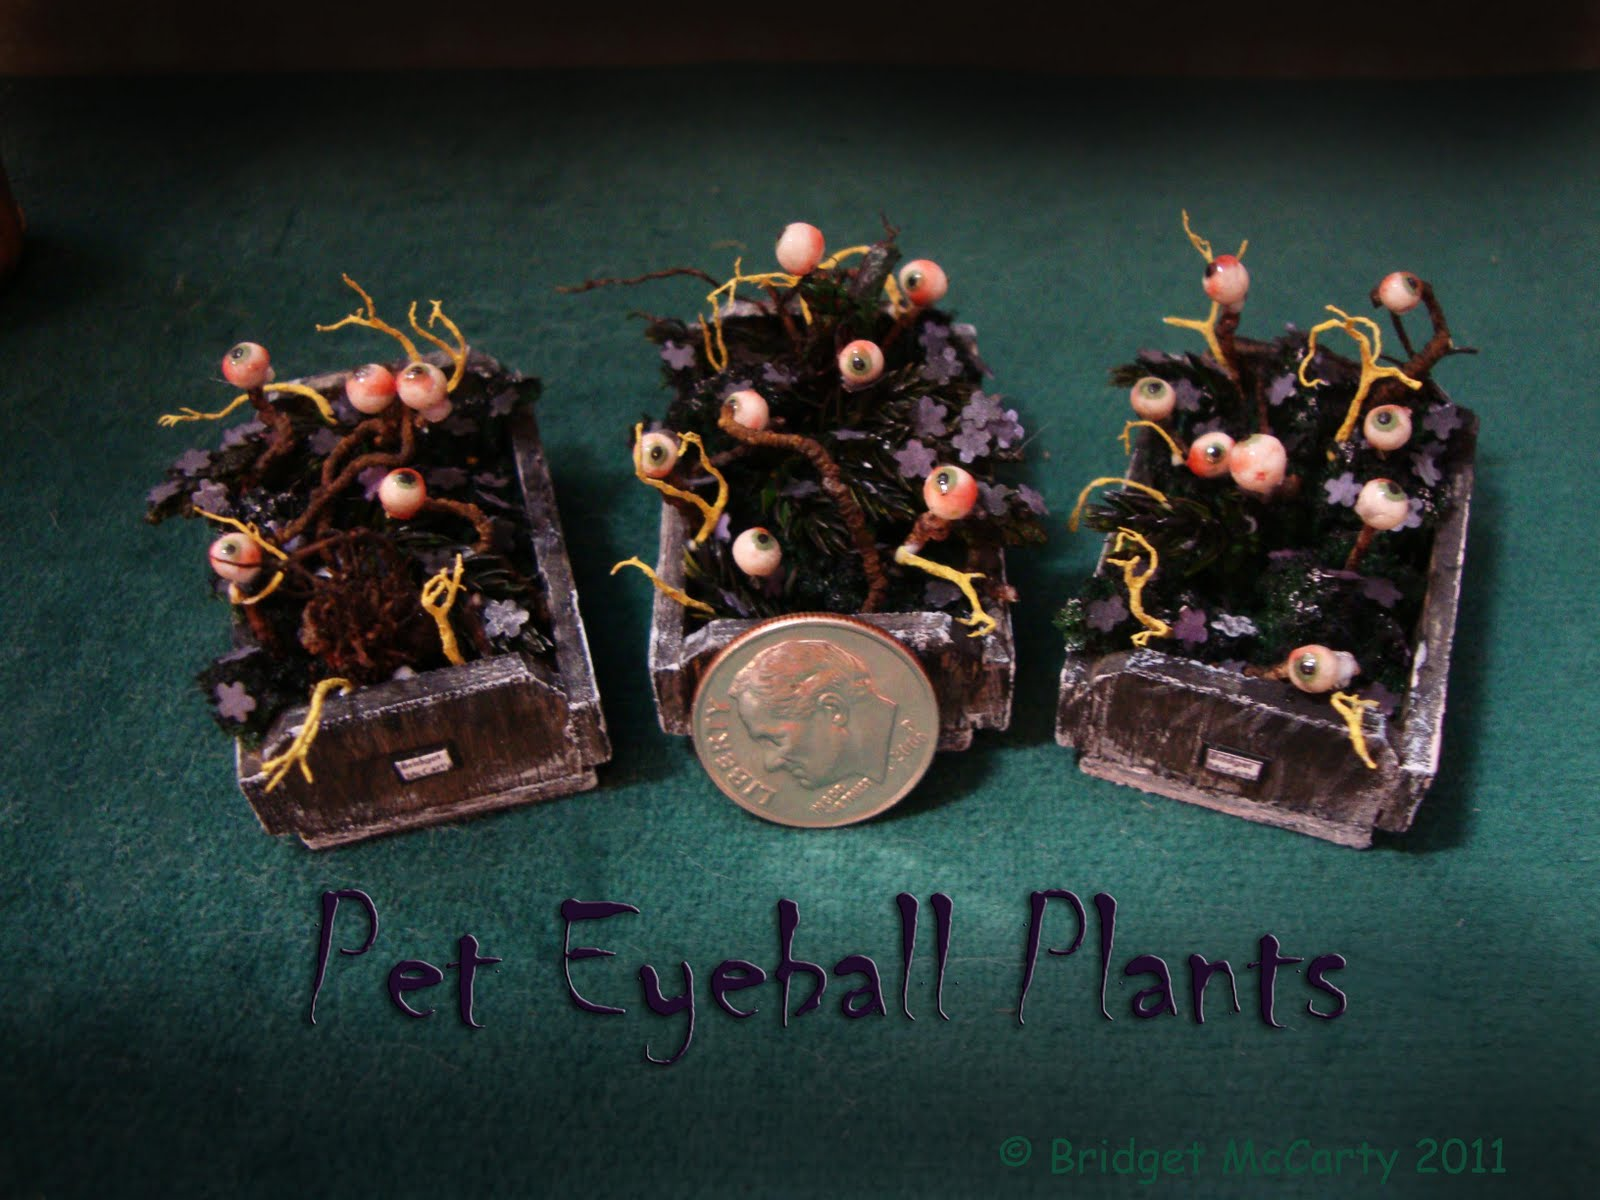 new dollhouse miniature halloween pets bridget mccarty